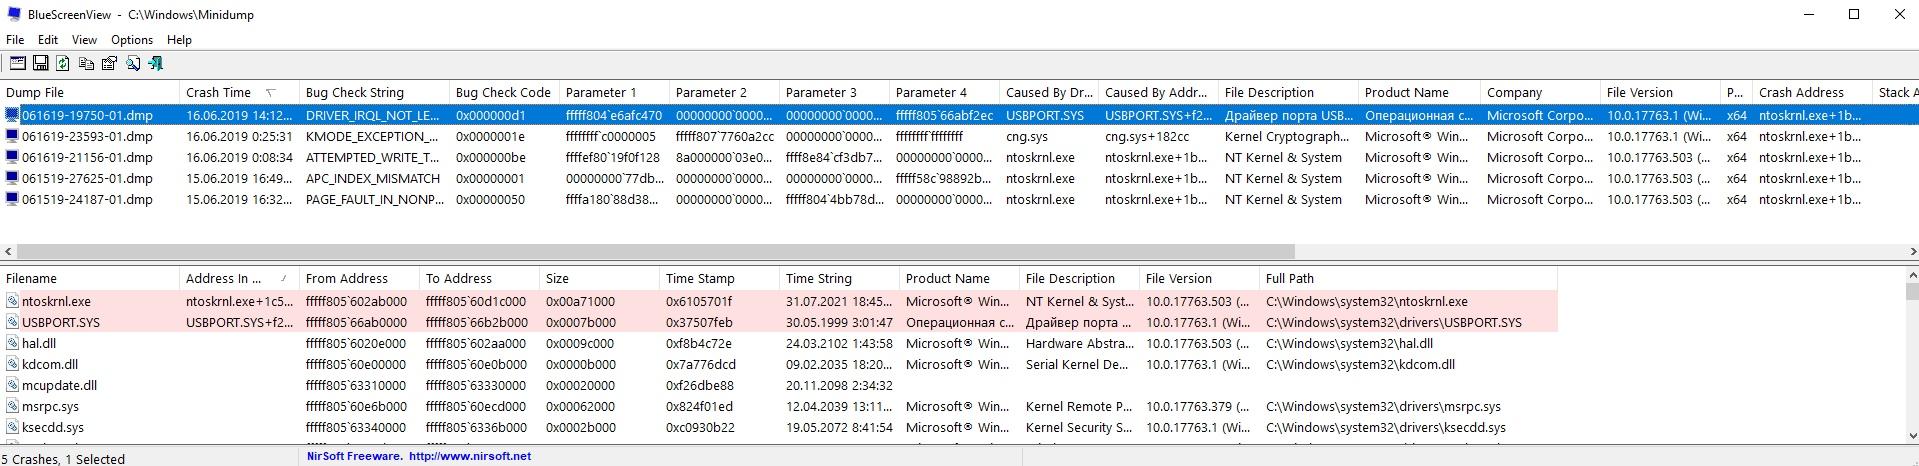 Dmp file windows 10